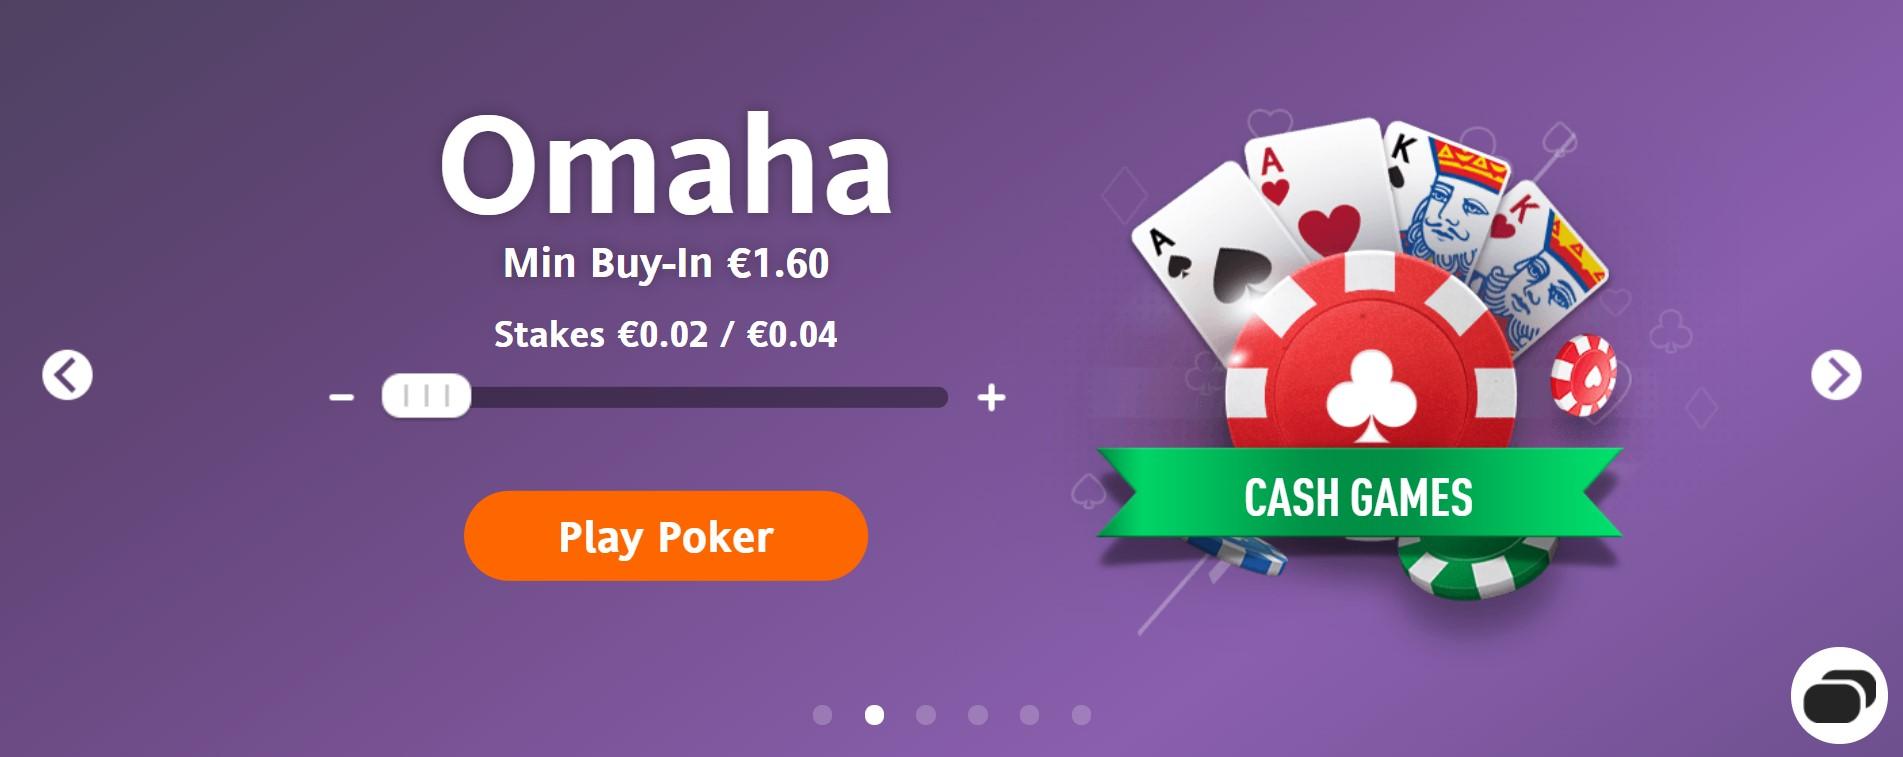 Cash Game Omaha